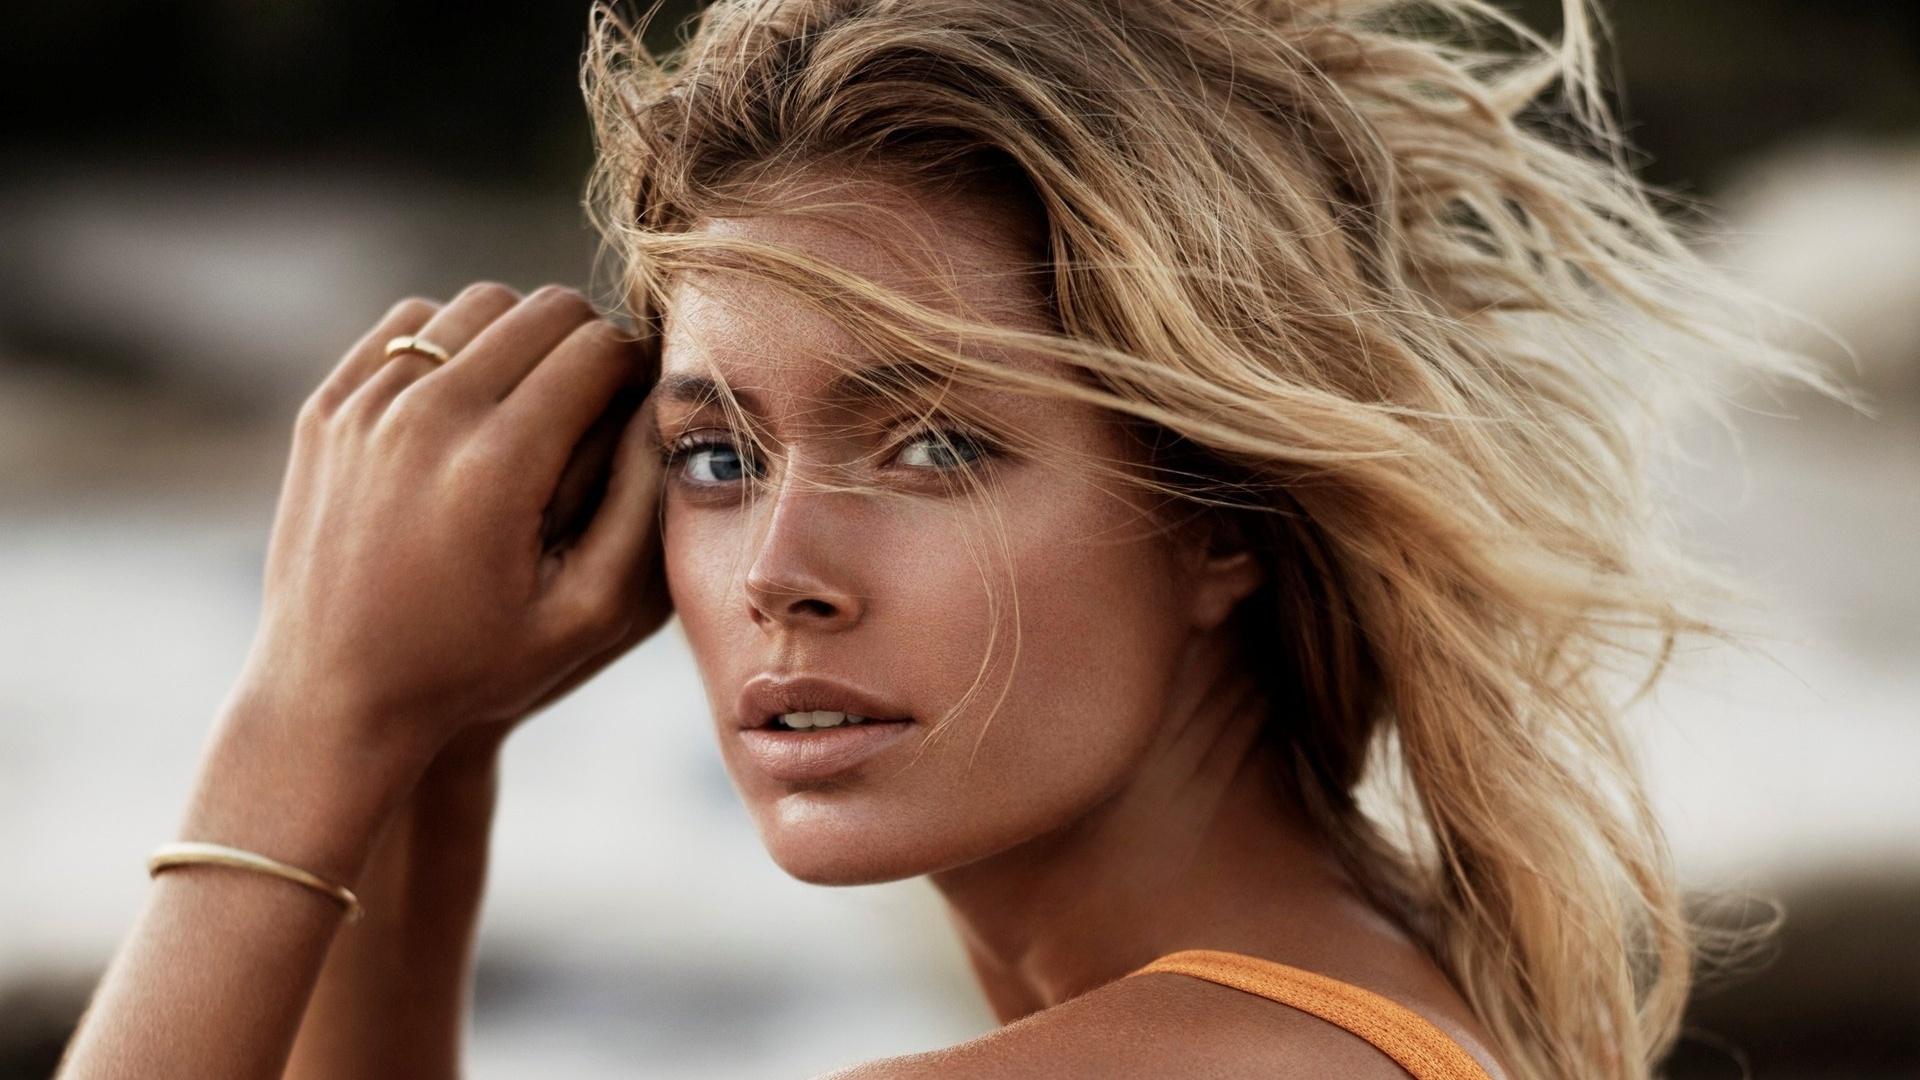 modeling-photography-photo-editing-example